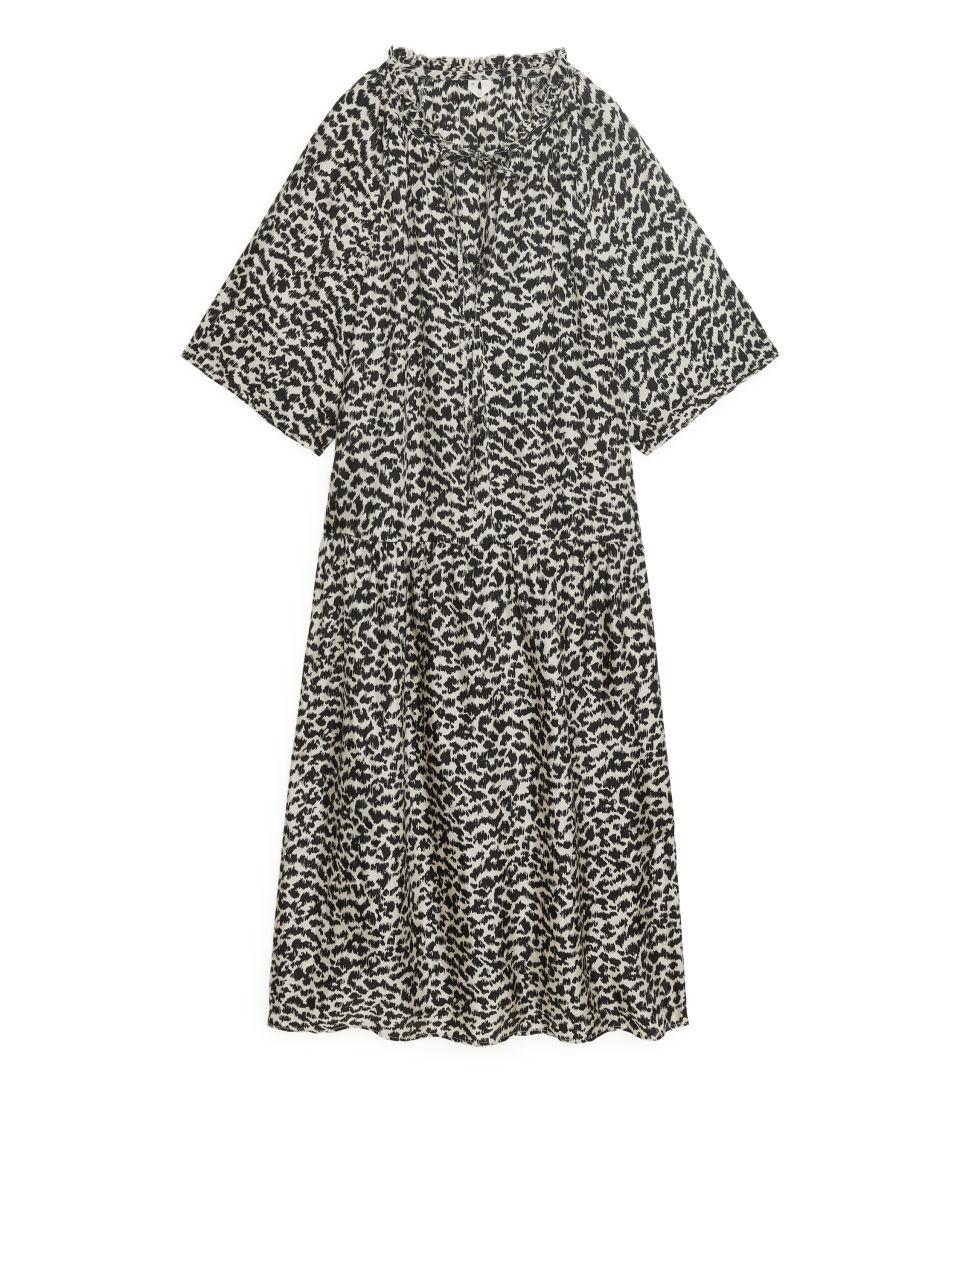 Printed A-Line Dress - Beige